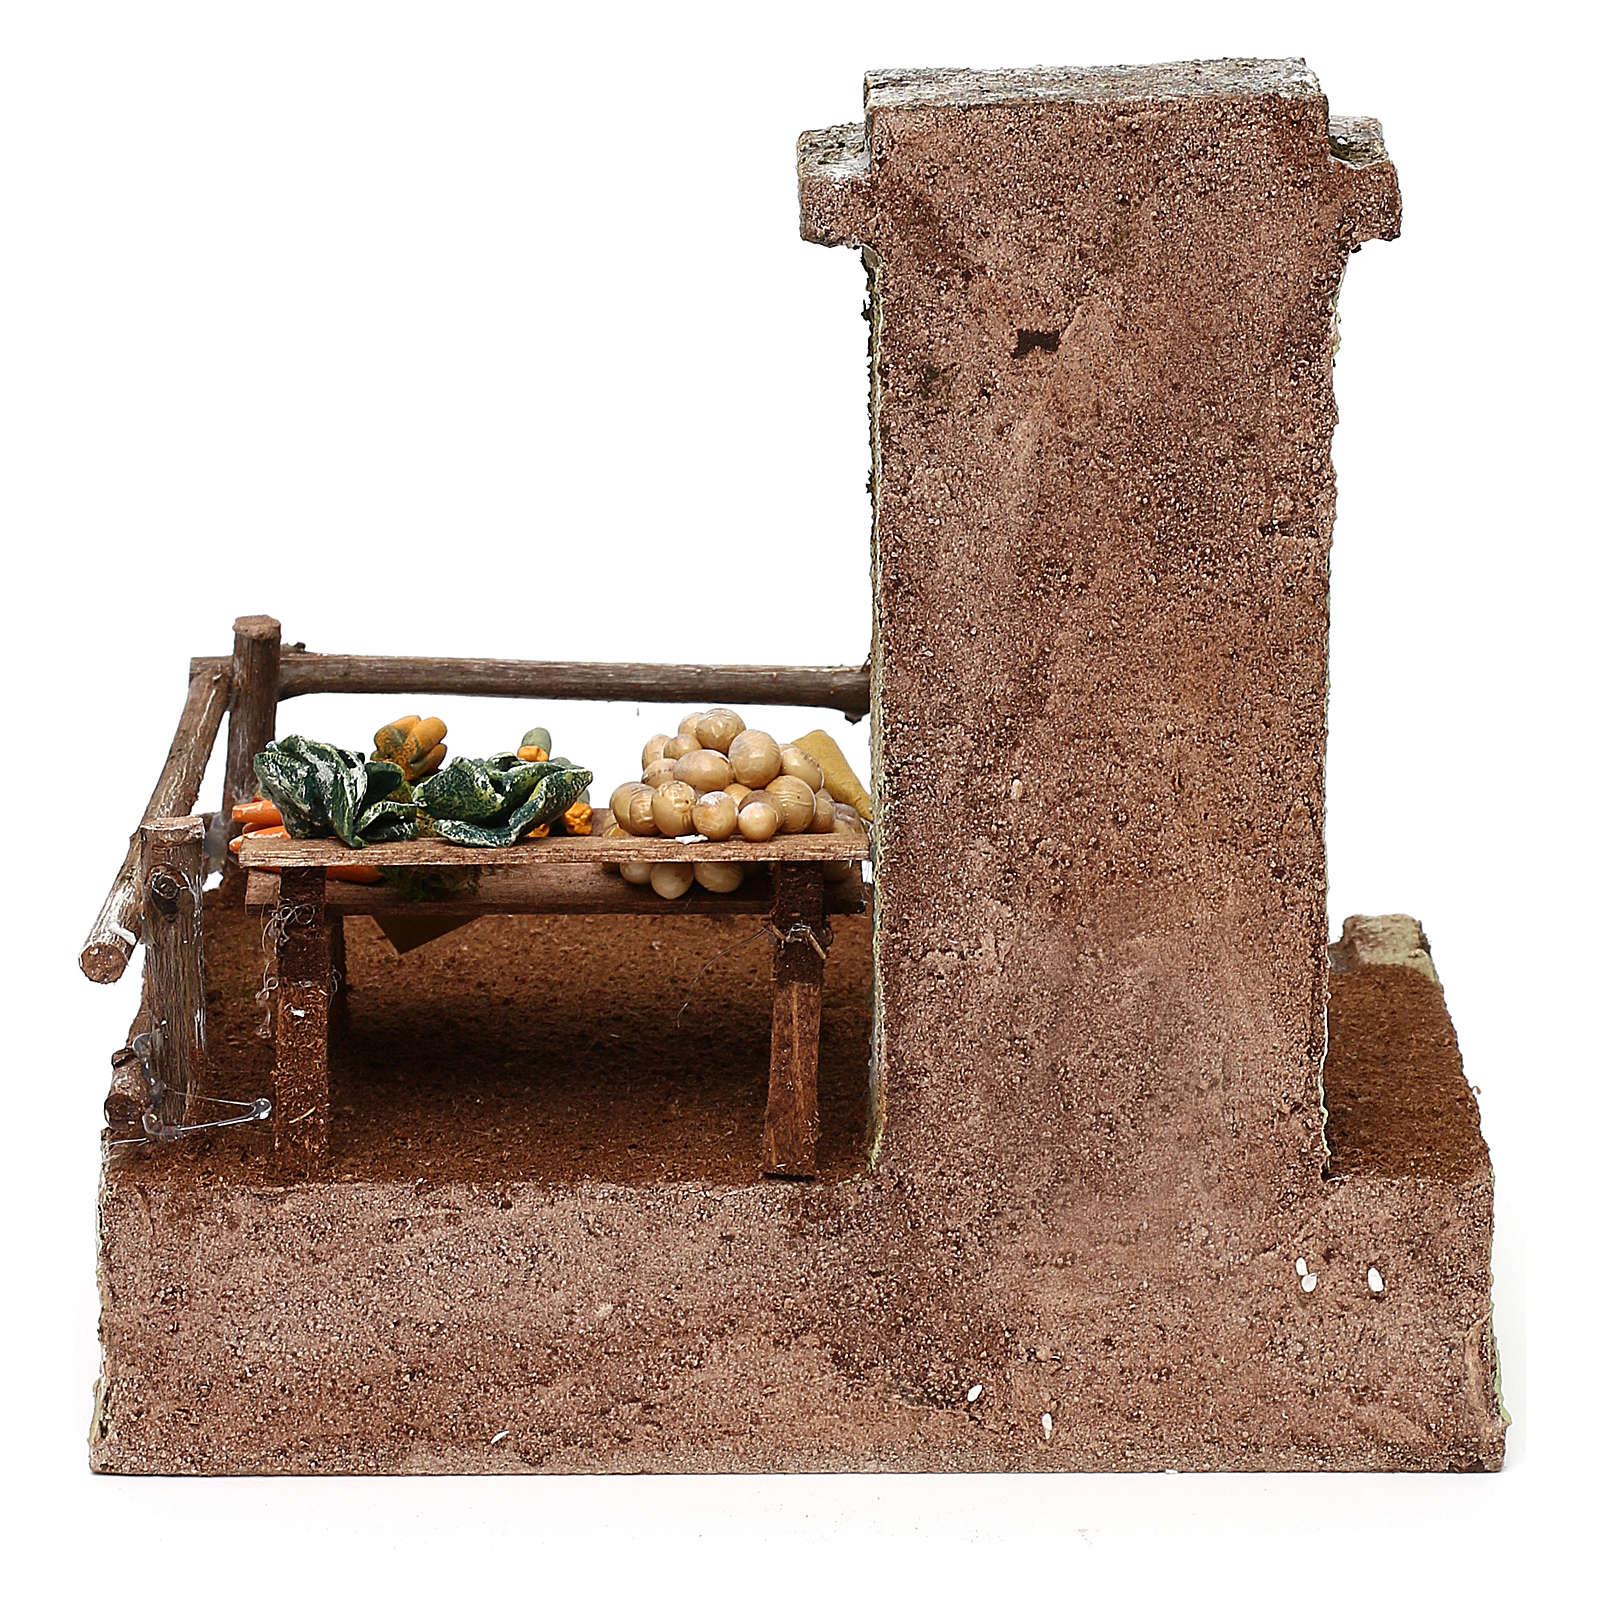 Resin setting for greengrocer for Nativity scene 10 cm 20x20x15 cm 4